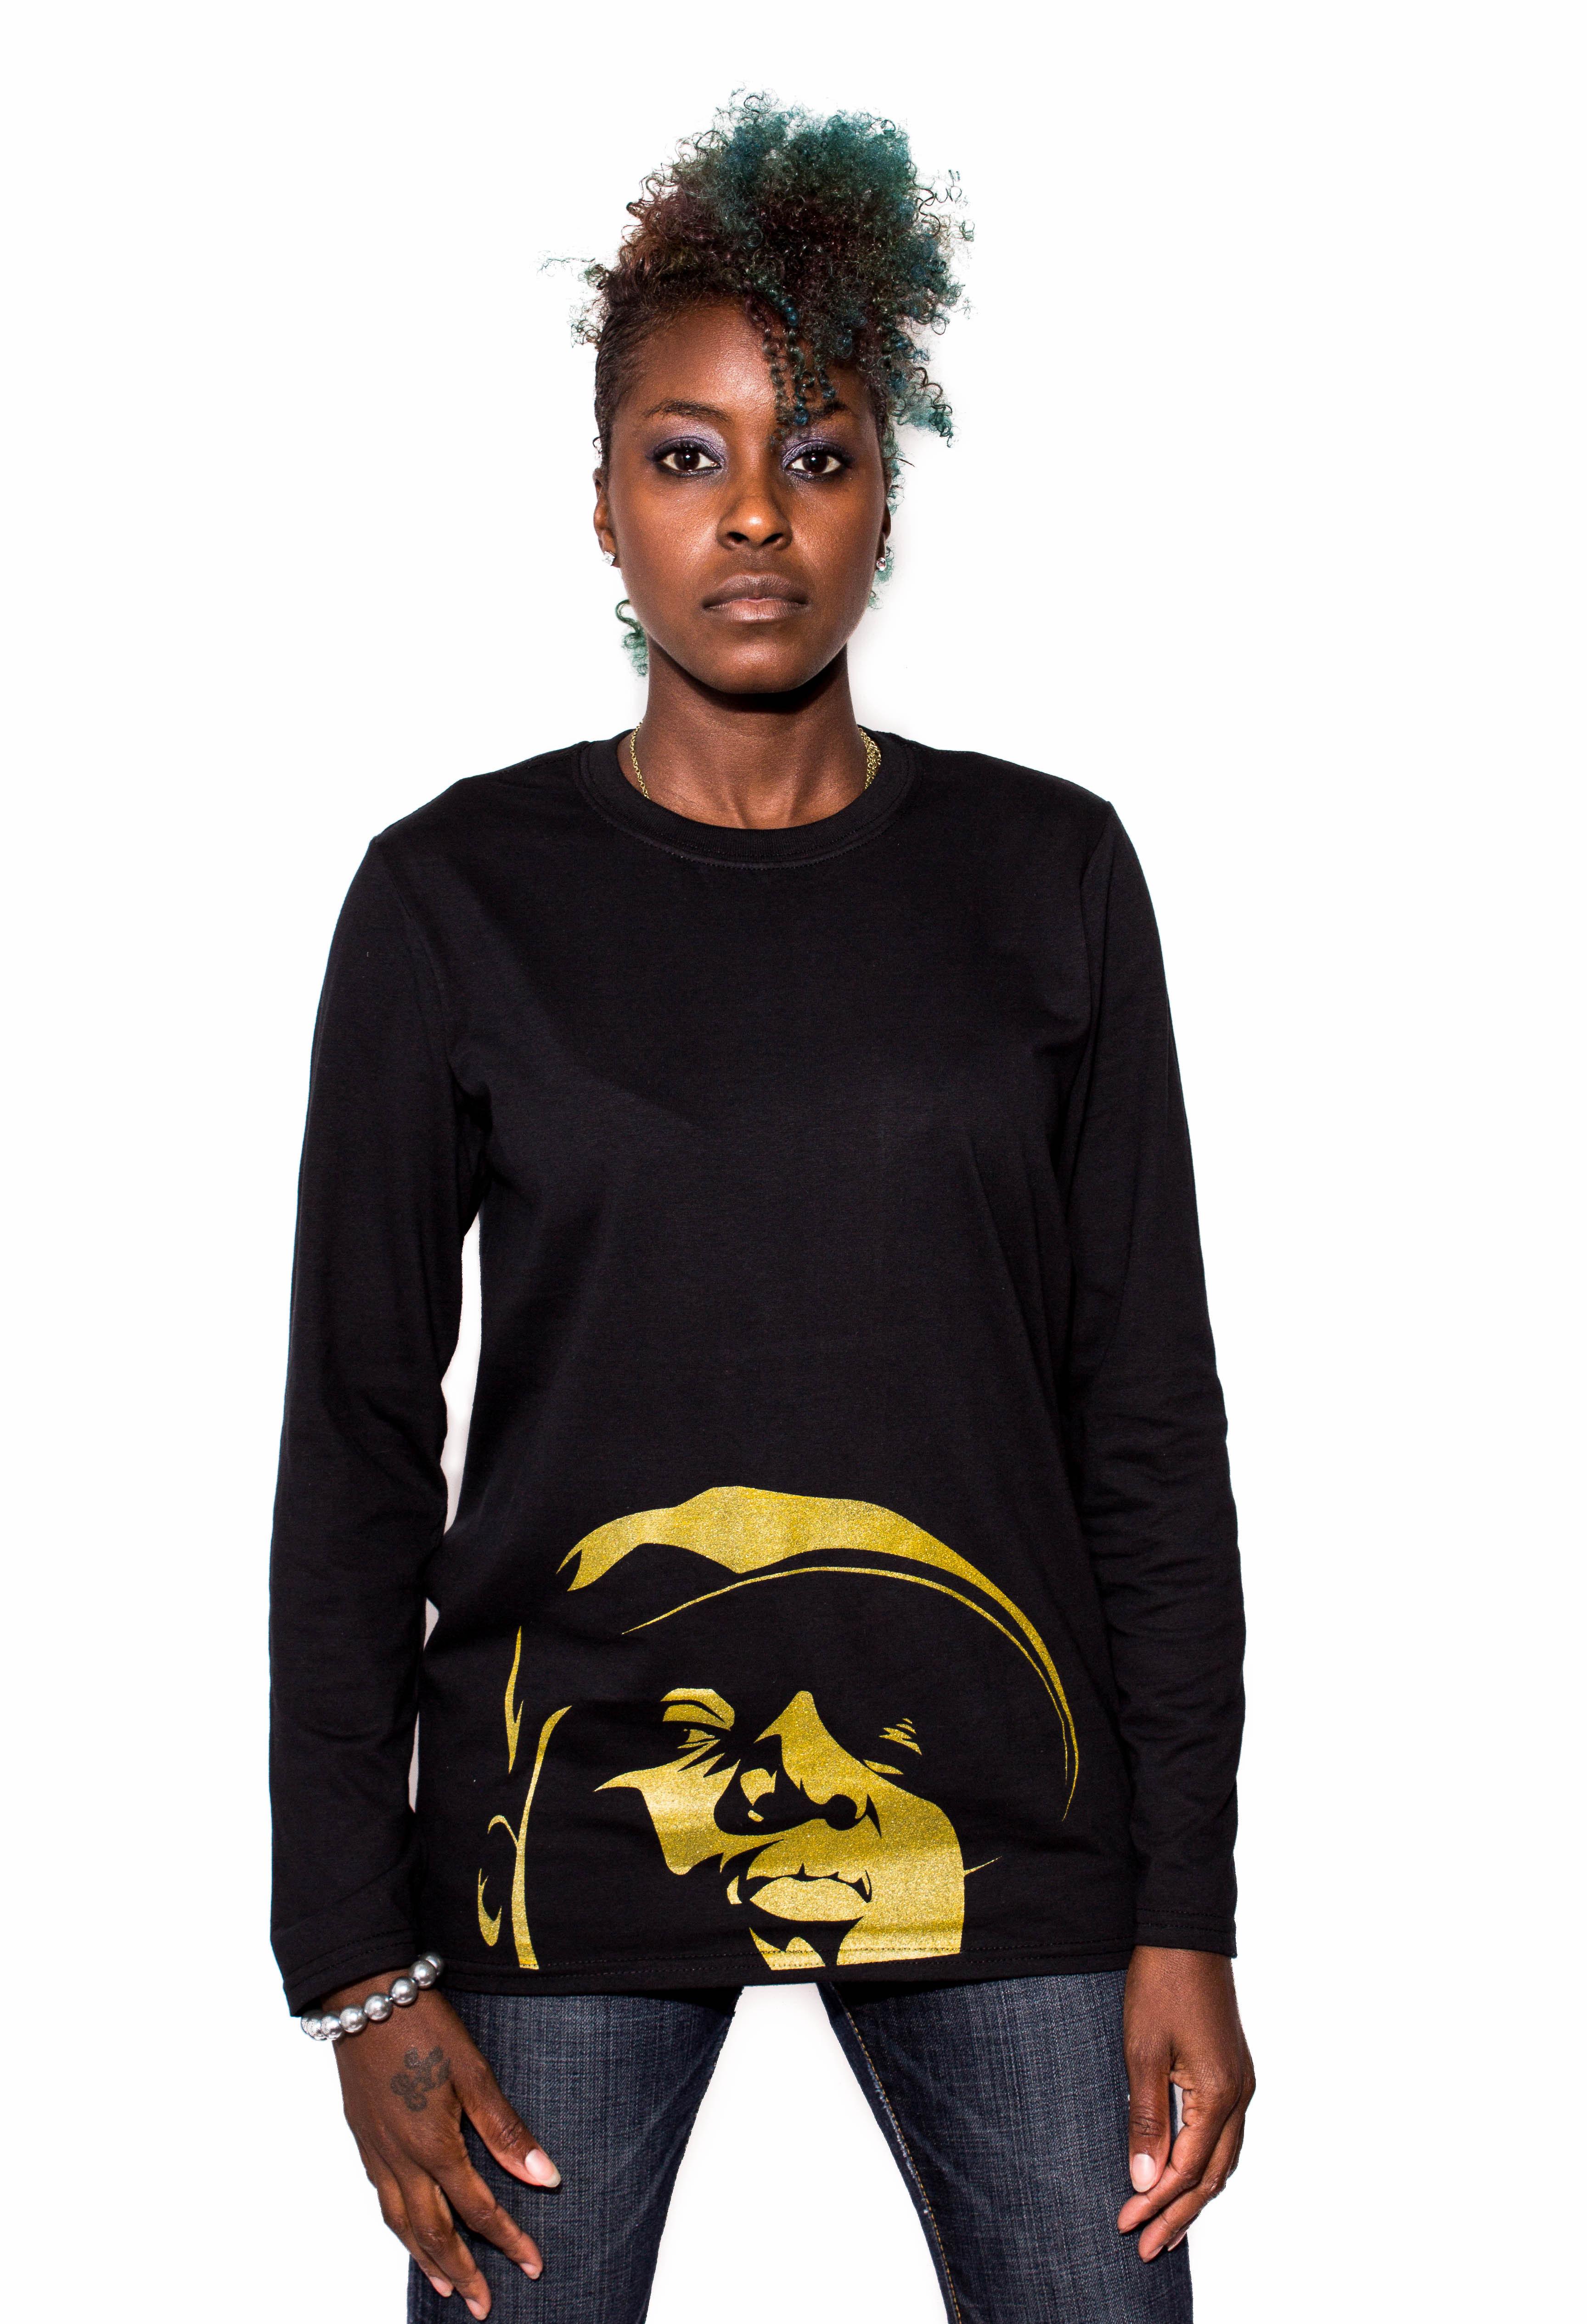 Notorious Big Long Sleeves T Shirt Gold Printing On Storenvy